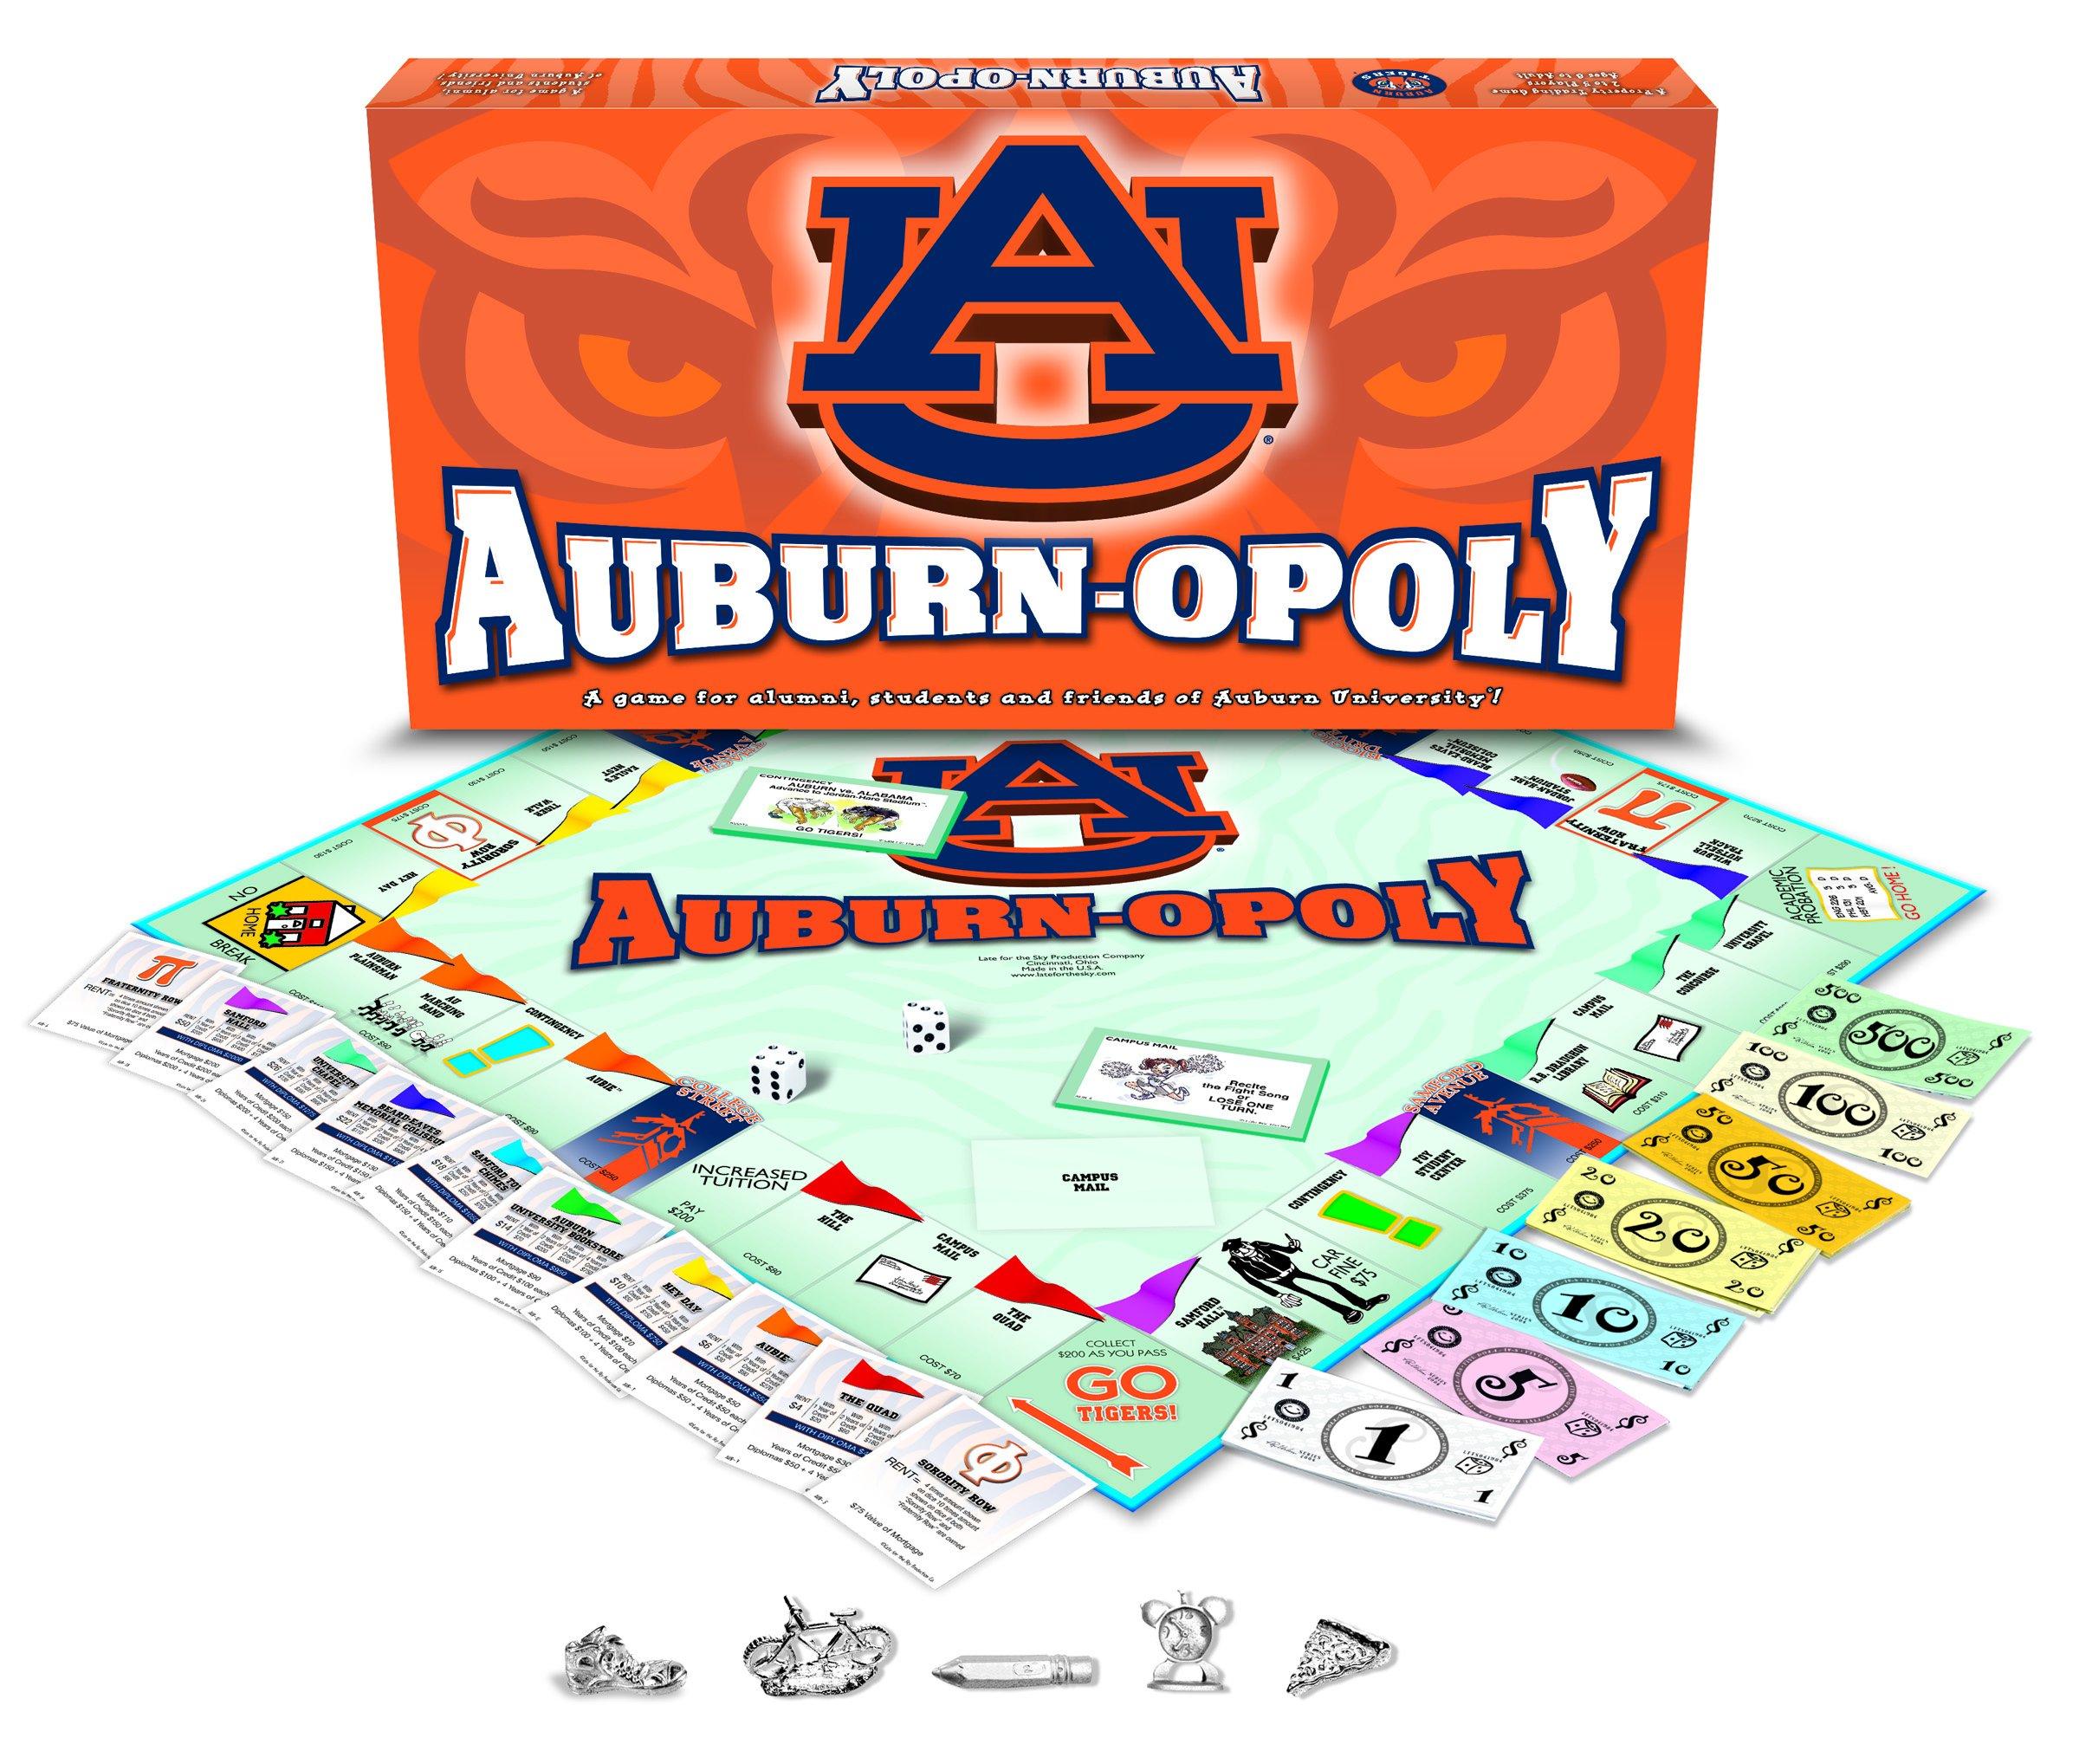 Auburn University - Auburnopoly